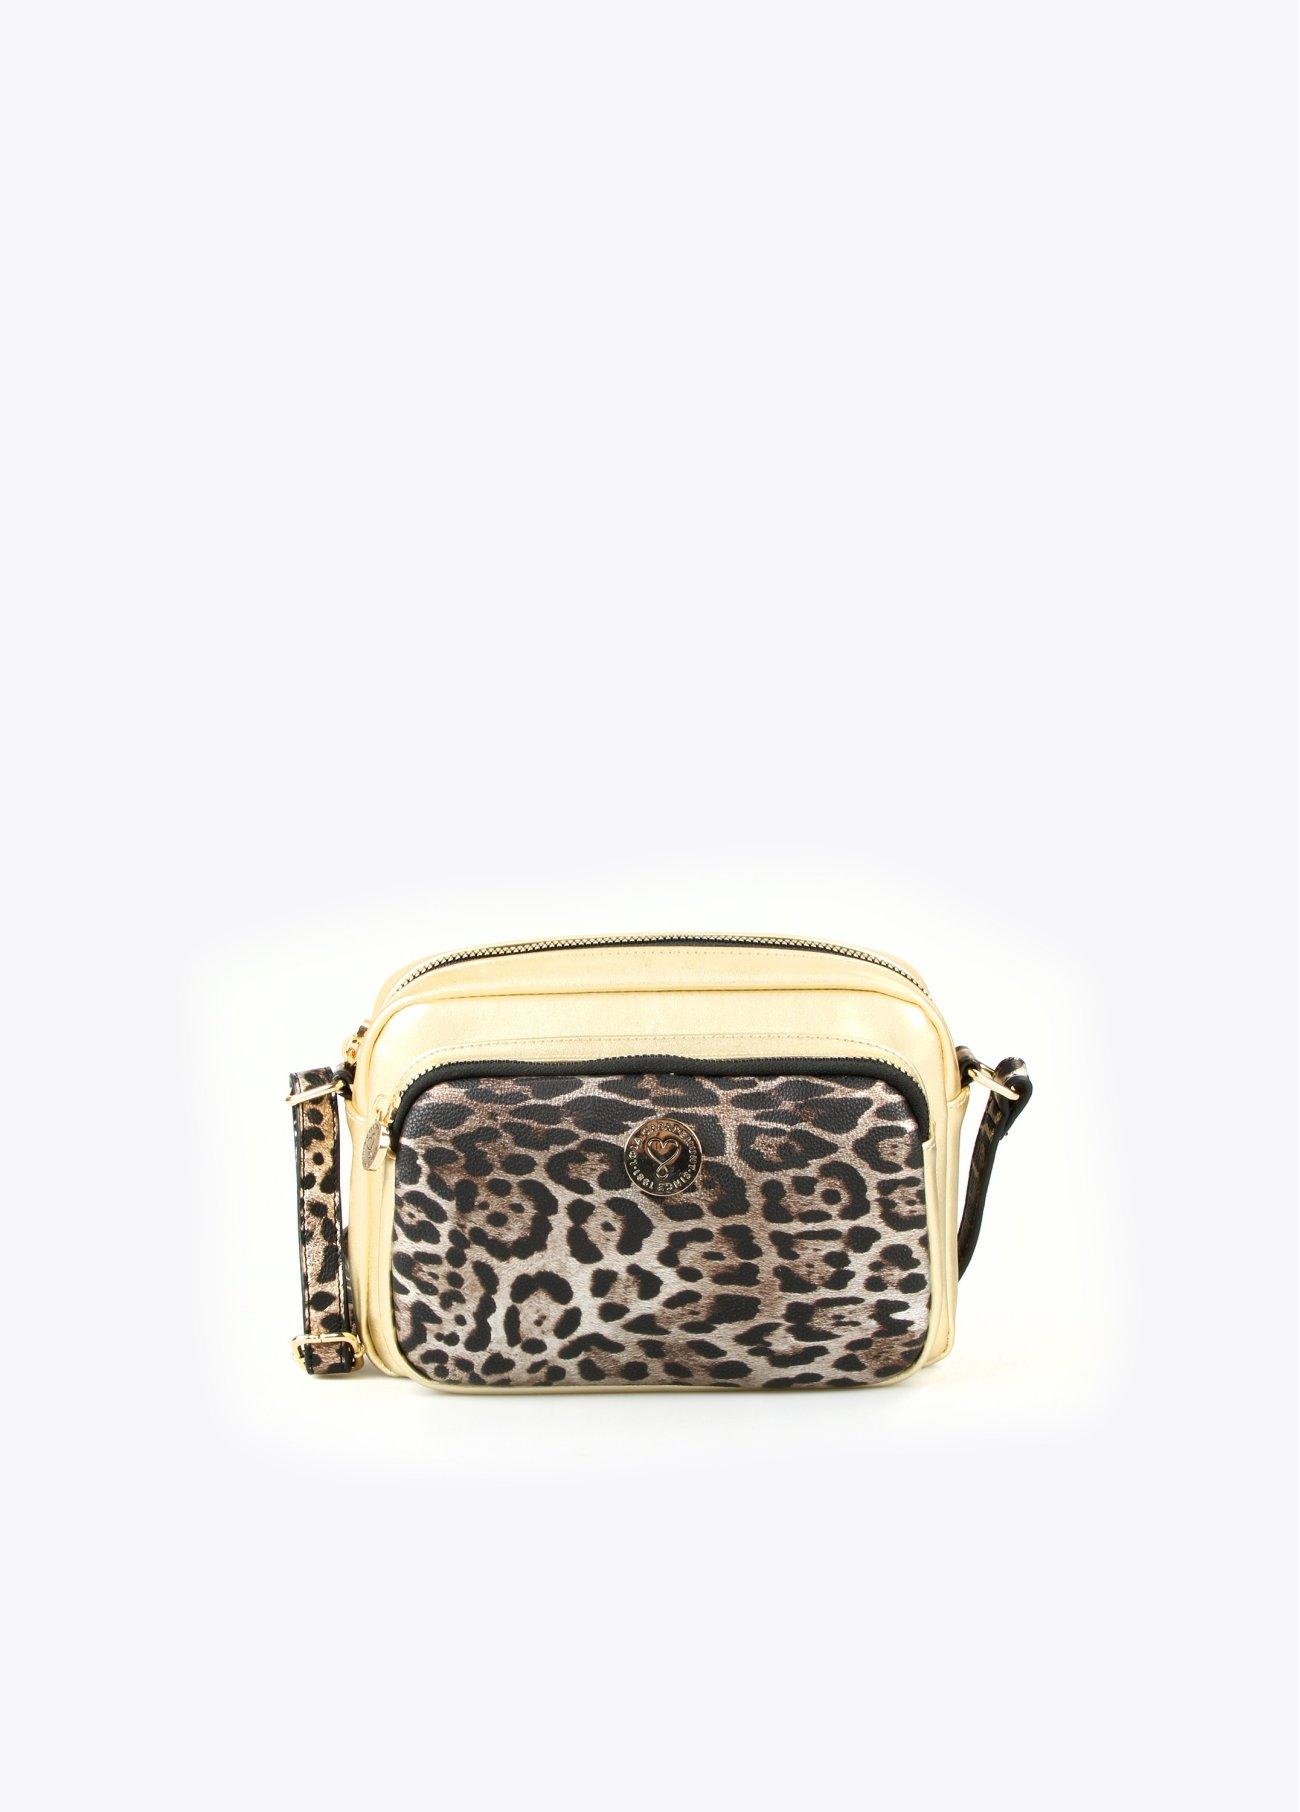 Bandolera dorada leopardo, dorado 2